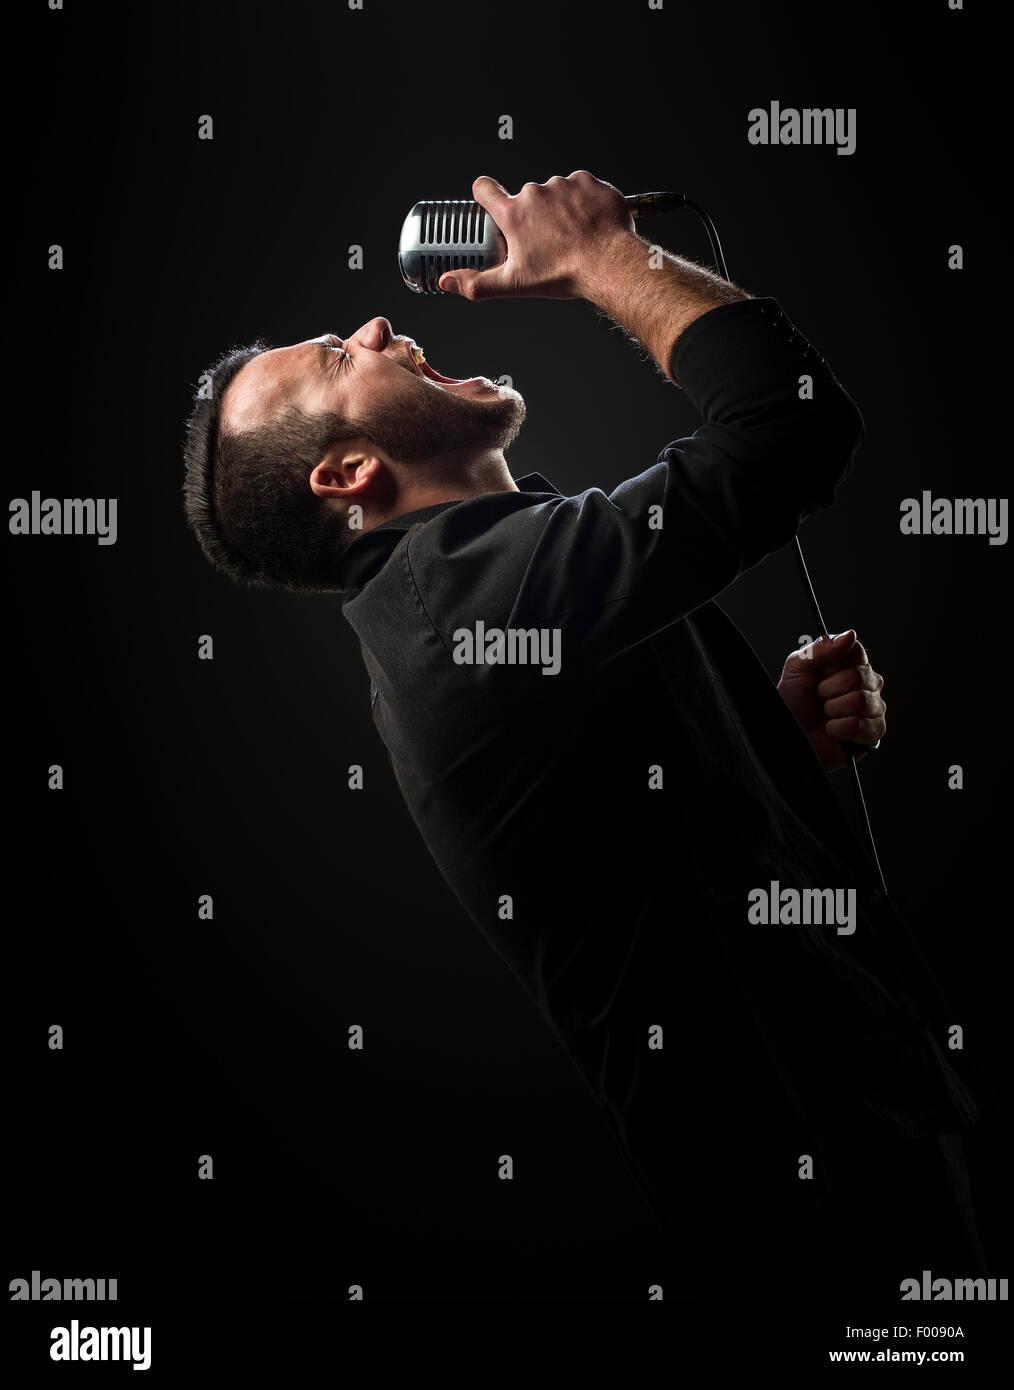 La cantante realiza con micrófono contra un fondo oscuro Imagen De Stock